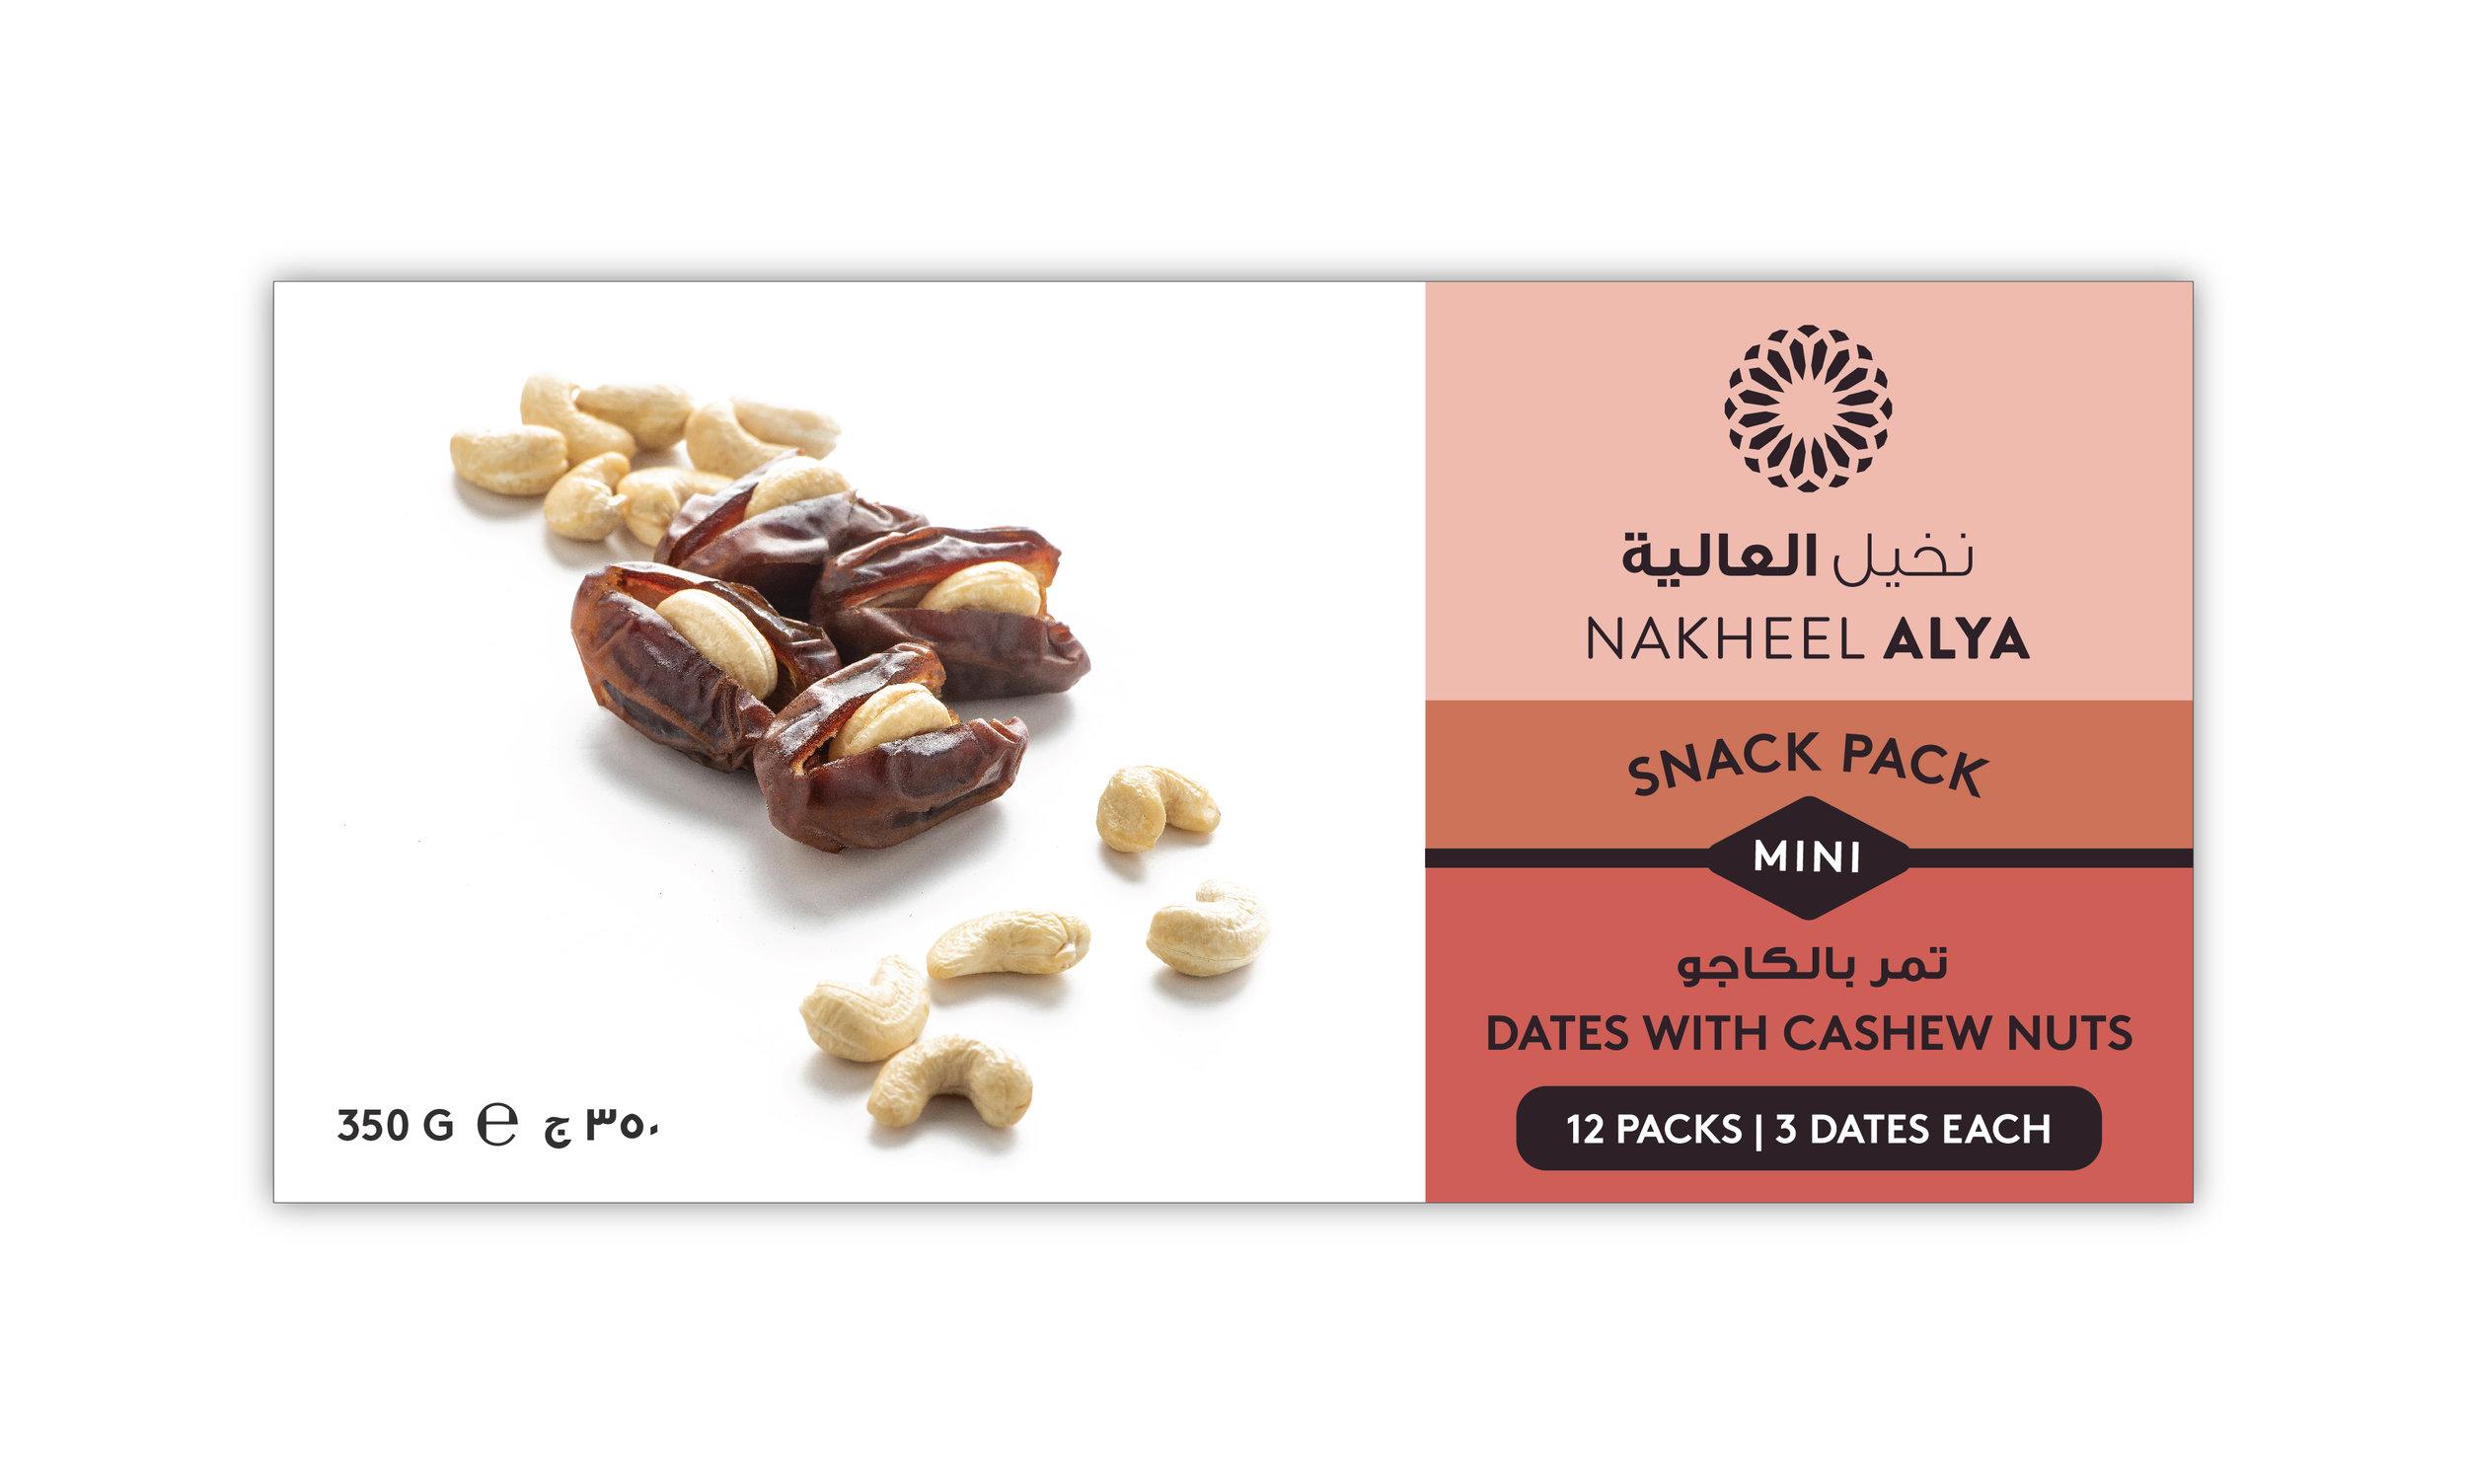 Snack Pack Mini Box_Dates with Cashew Nut_WEB.jpg